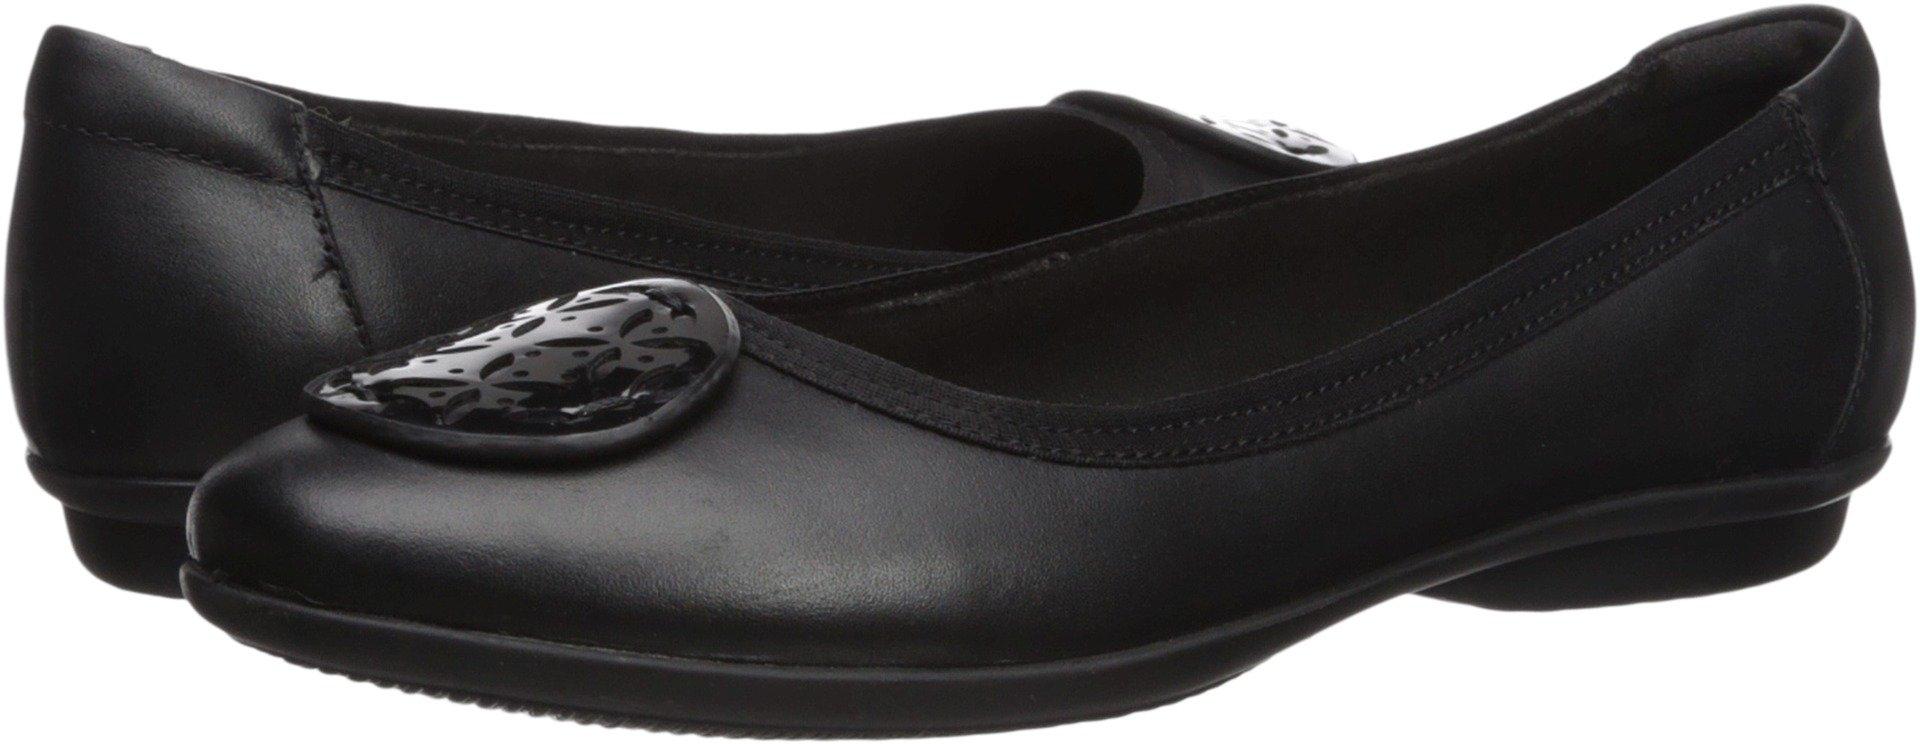 CLARKS Women's Gracelin Lola Ballet Flat Black Leather/Synthetic Combo 7 Medium US